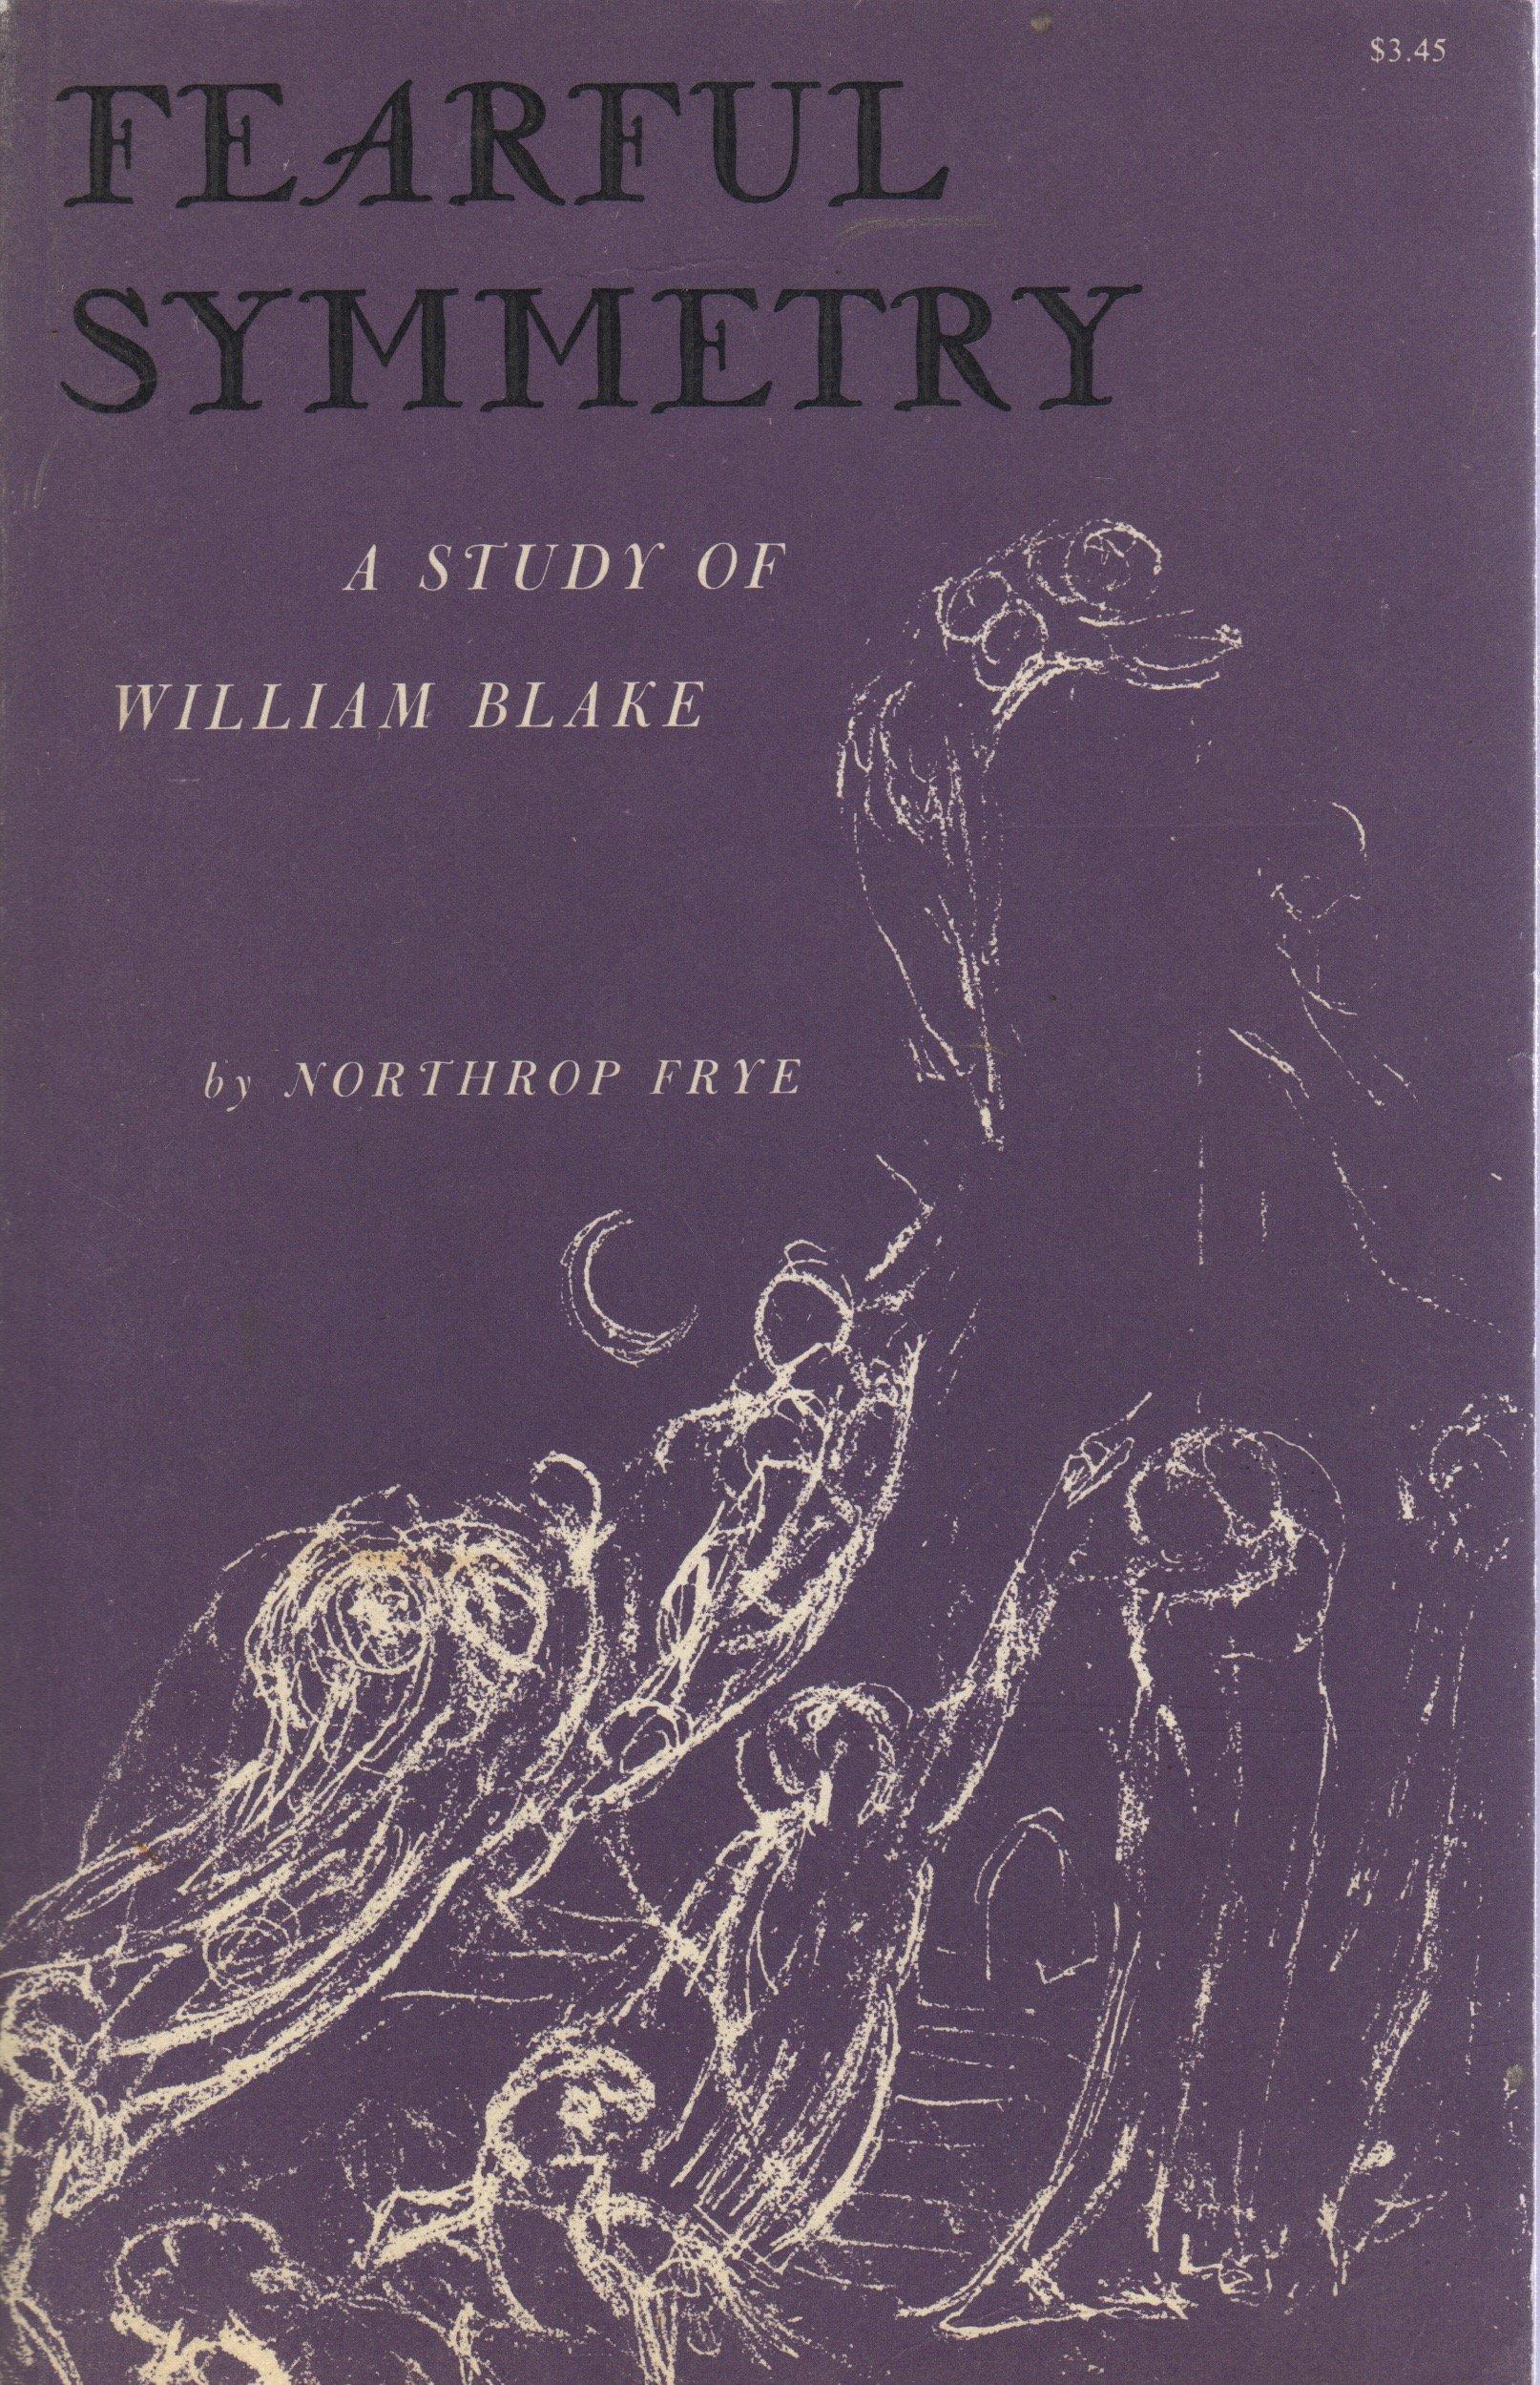 Fearful Symmetry A Study Of William Blake By Northrop Frye Northrop Frye 9780691012919 Amazon Com Books